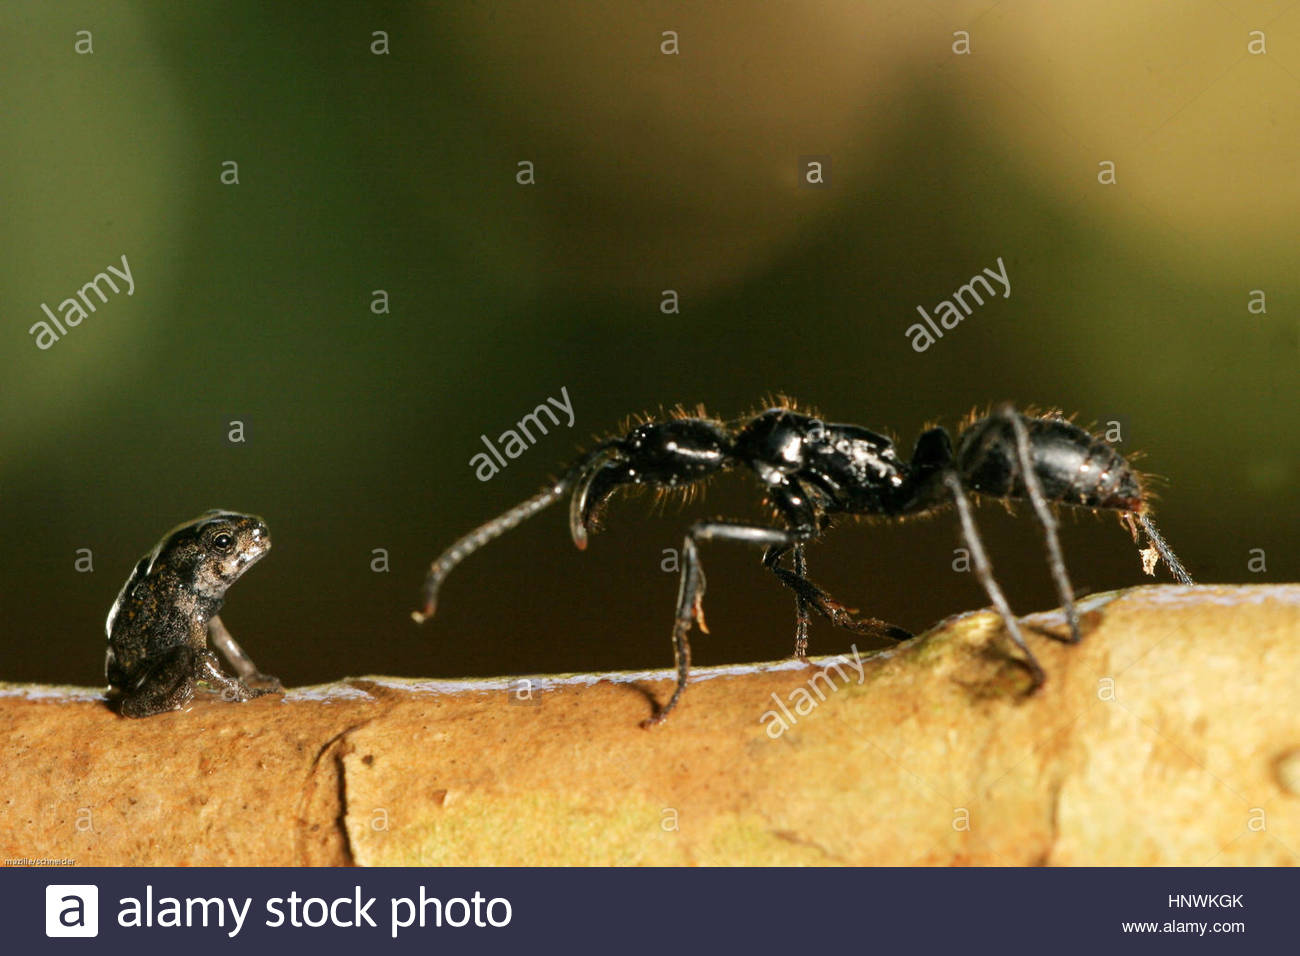 A ponara ant and a small buffalo toad (bufo marinus), Guyana. - Stock Image